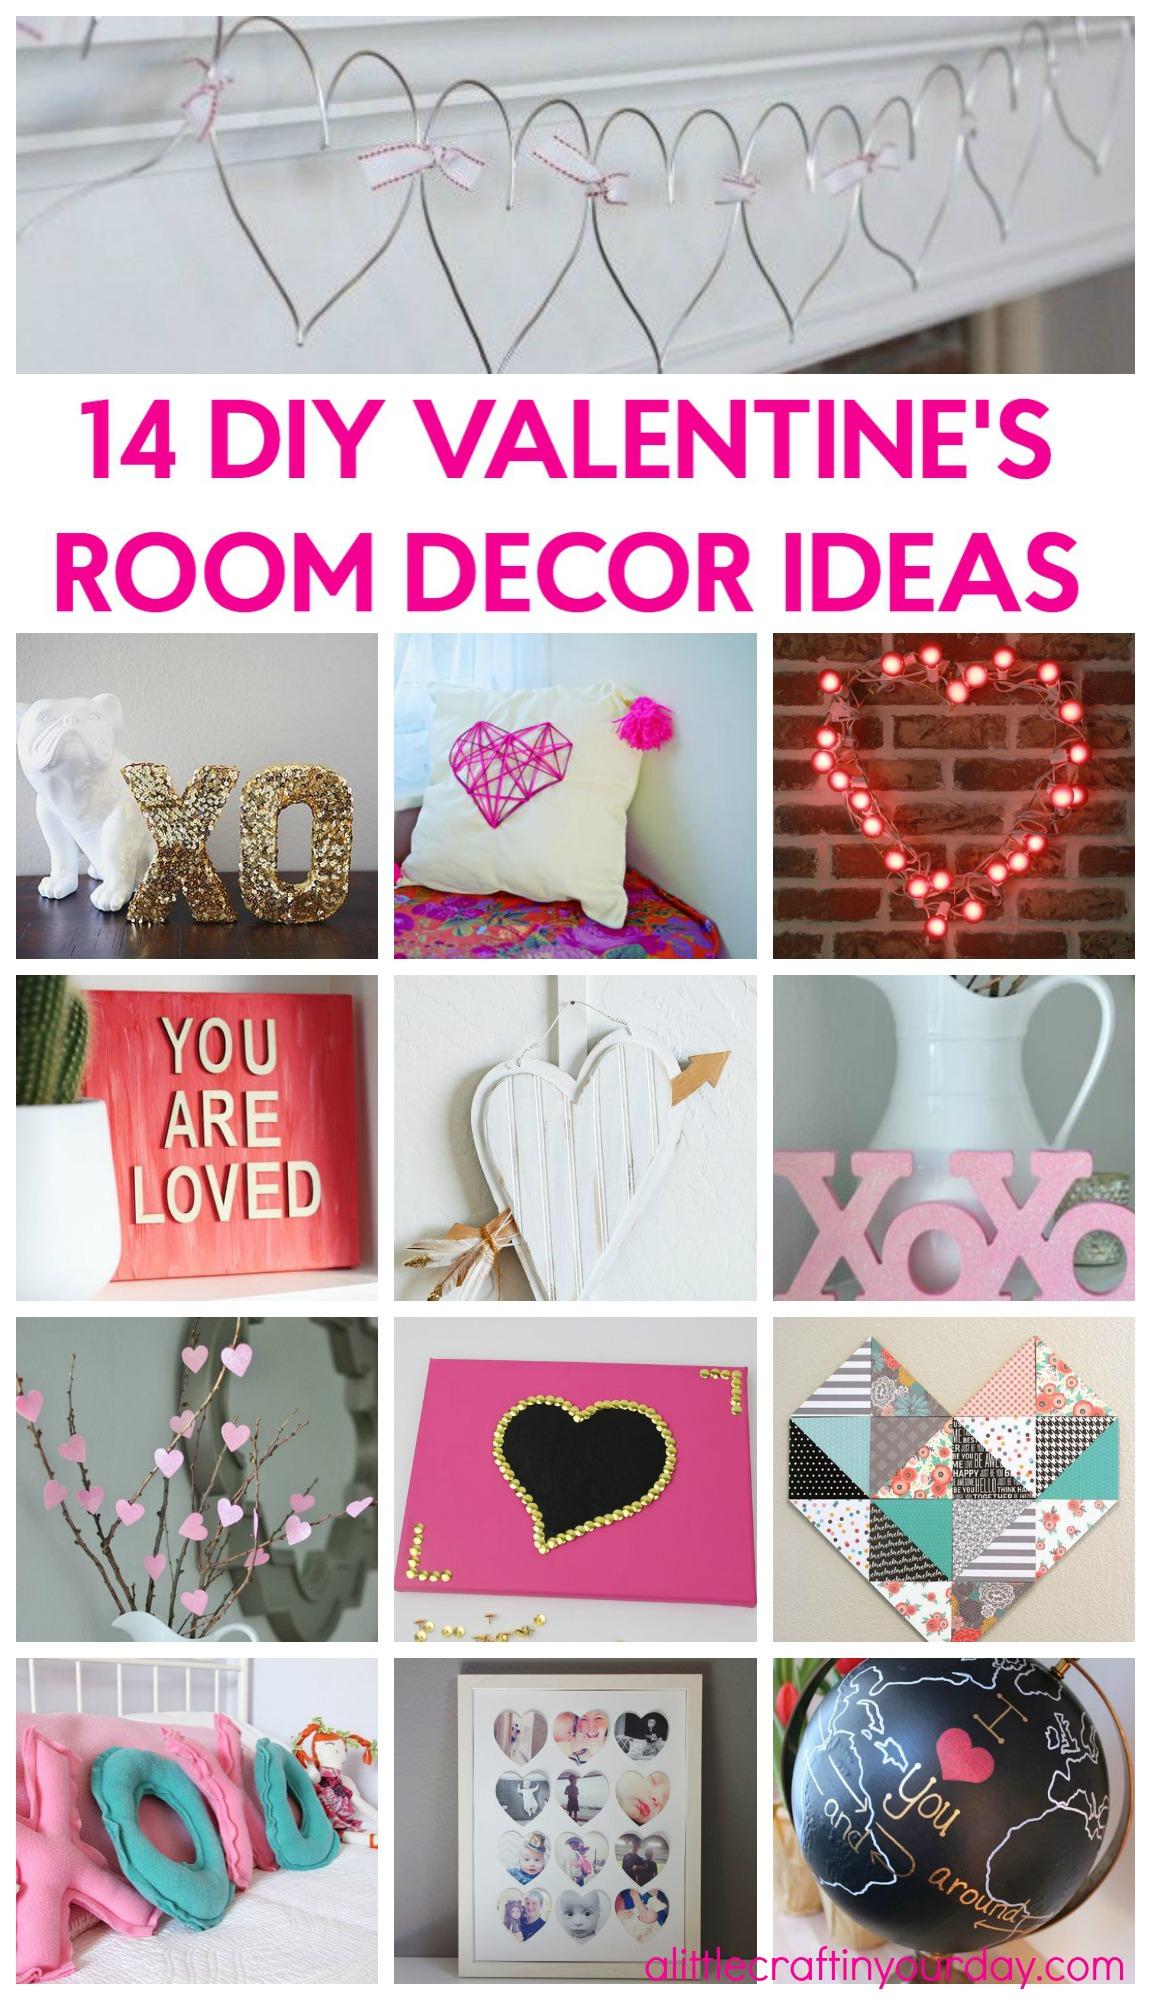 14_Valentine's_Room_Decor_Ideas